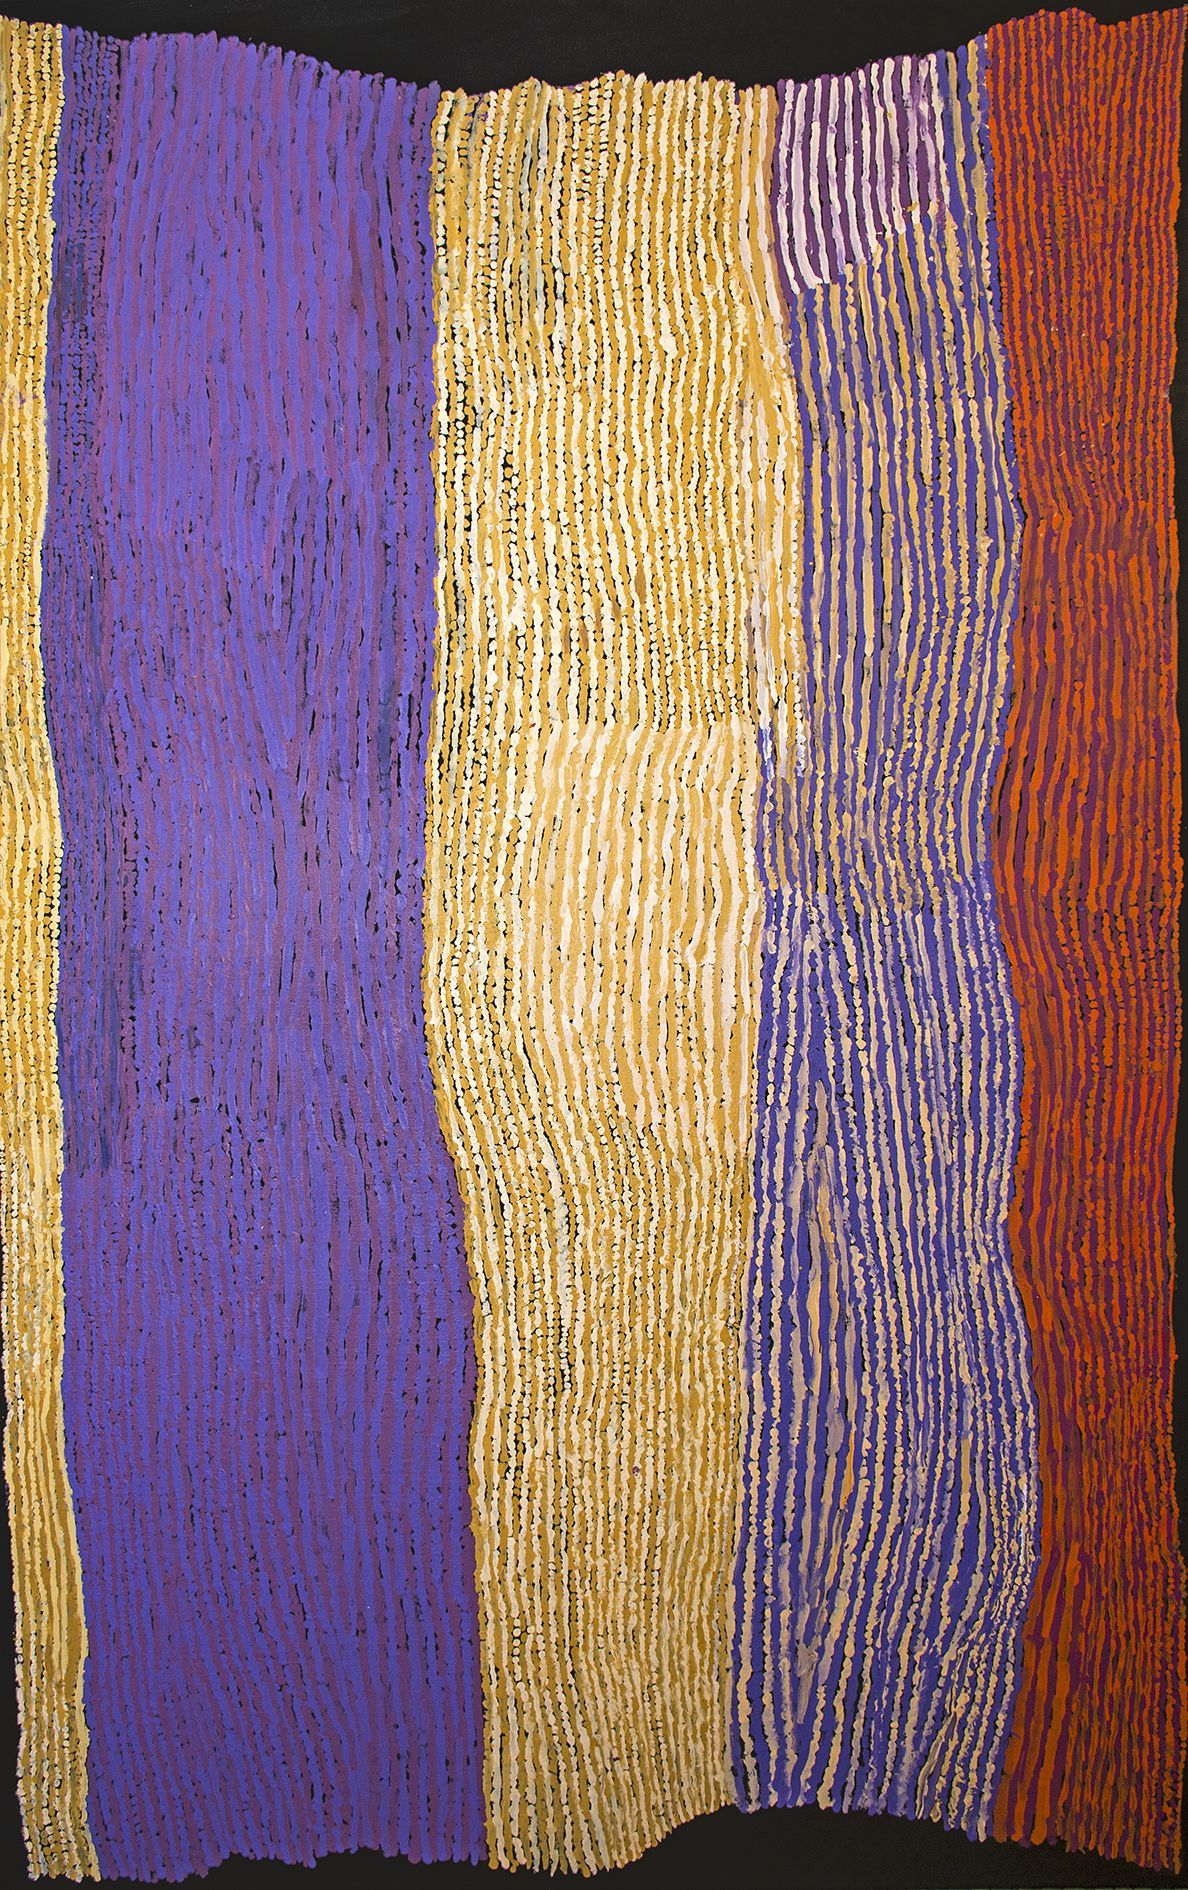 Ray Ken - Tali - Sand dune - 198x122 cm http://www.aboriginalsignature.com/art-aborigene-tjala/ray-ken-tali-sand-dune-198x122-cm-520-15